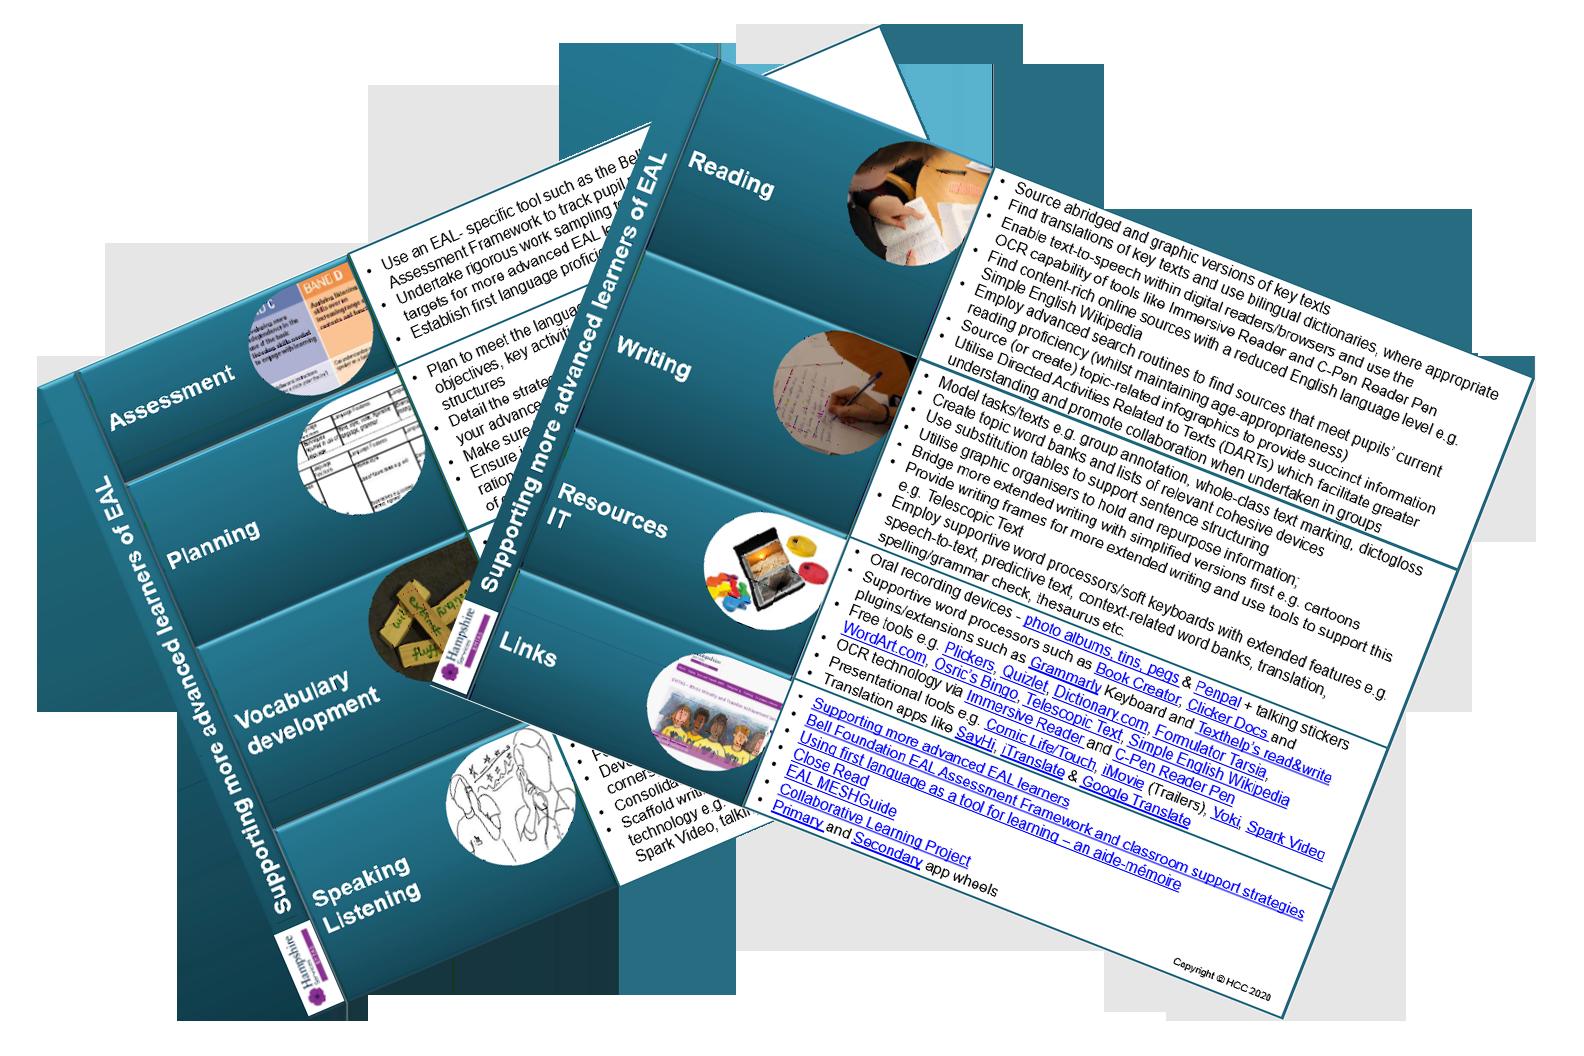 Advanced learners guidance